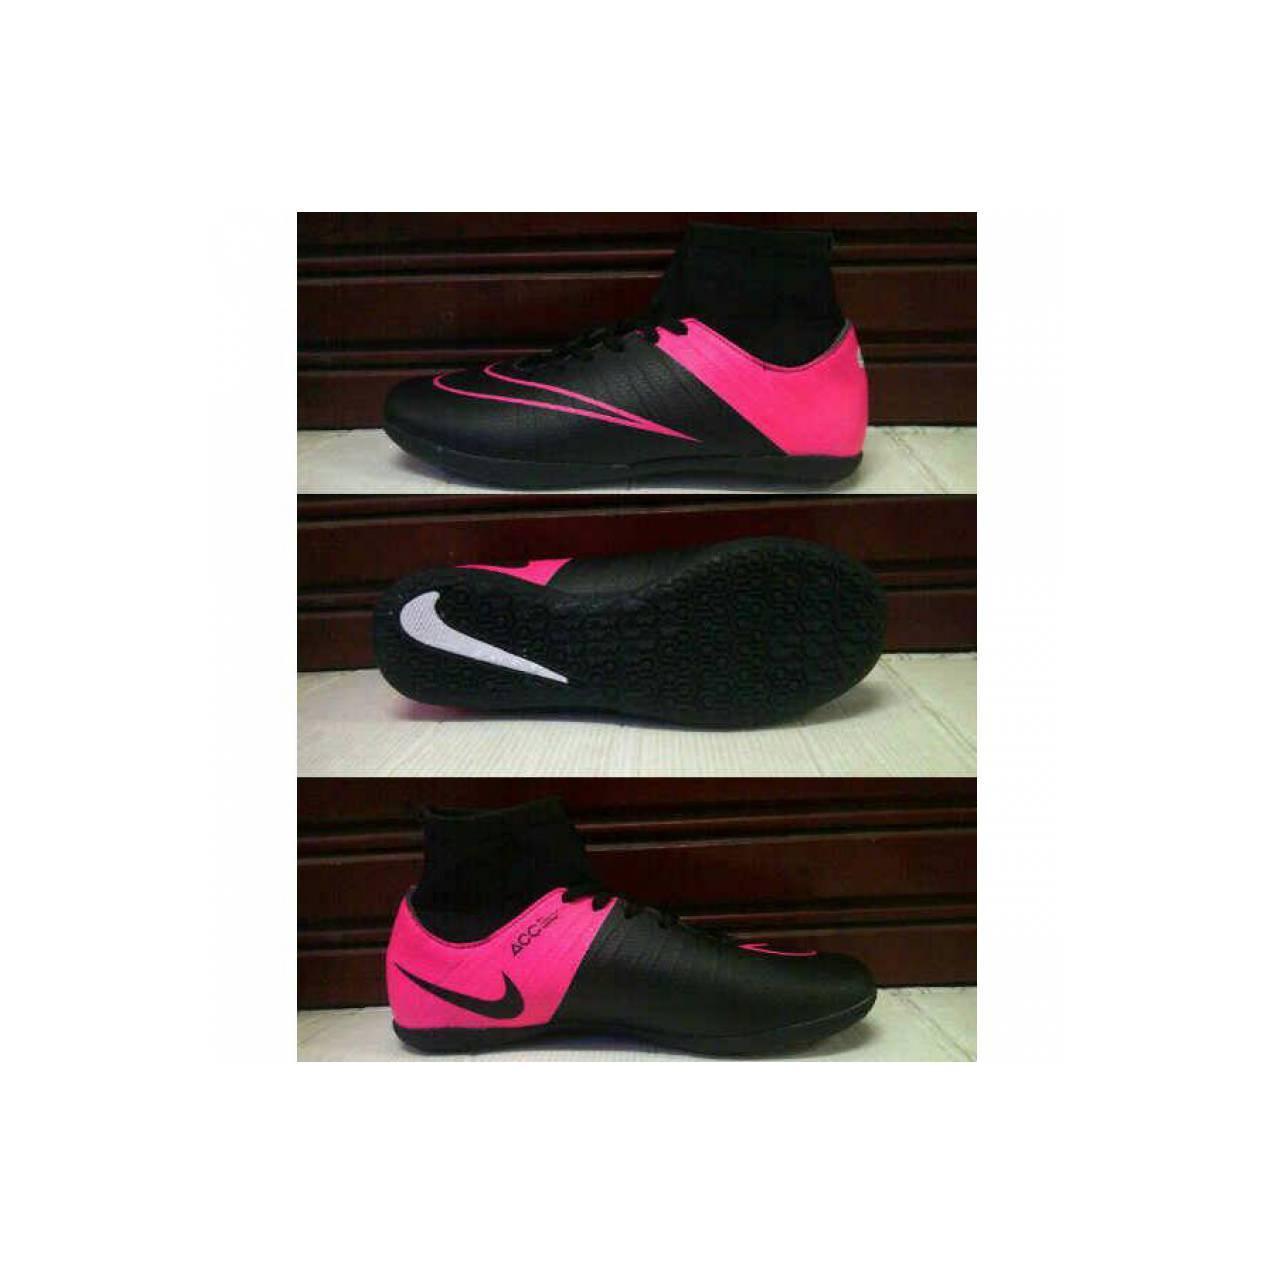 Sepatu Futsal Nike Mercurial Hitam Pink - Kualitas KW Super